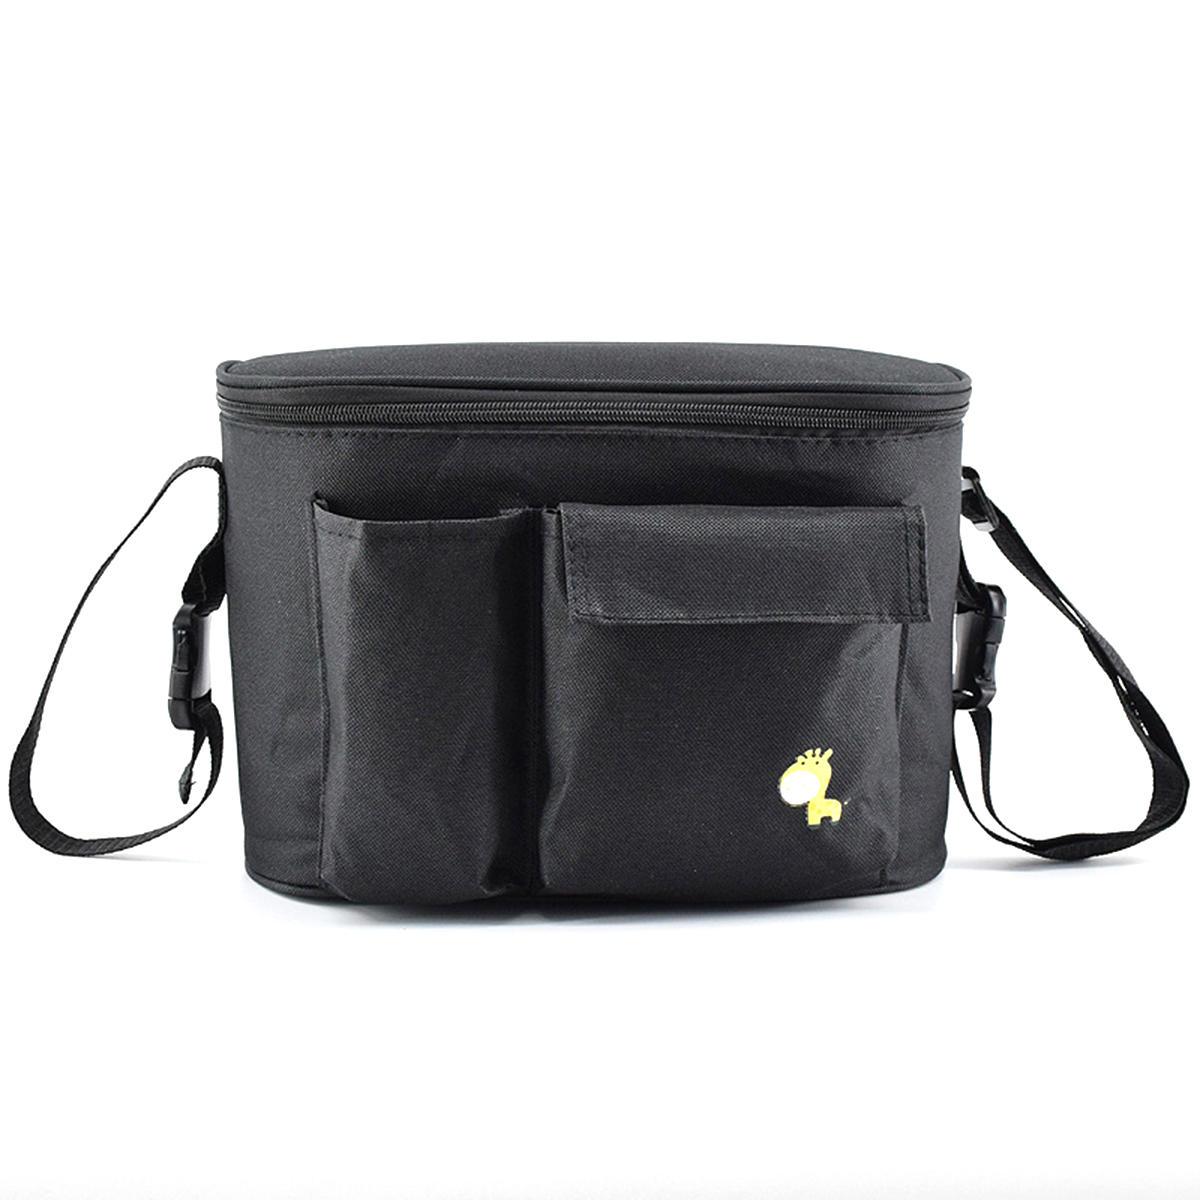 Travel Baby Nappy Changing Stroller Bag Shoulder Diaper Buggy Pram Pushchair Hot